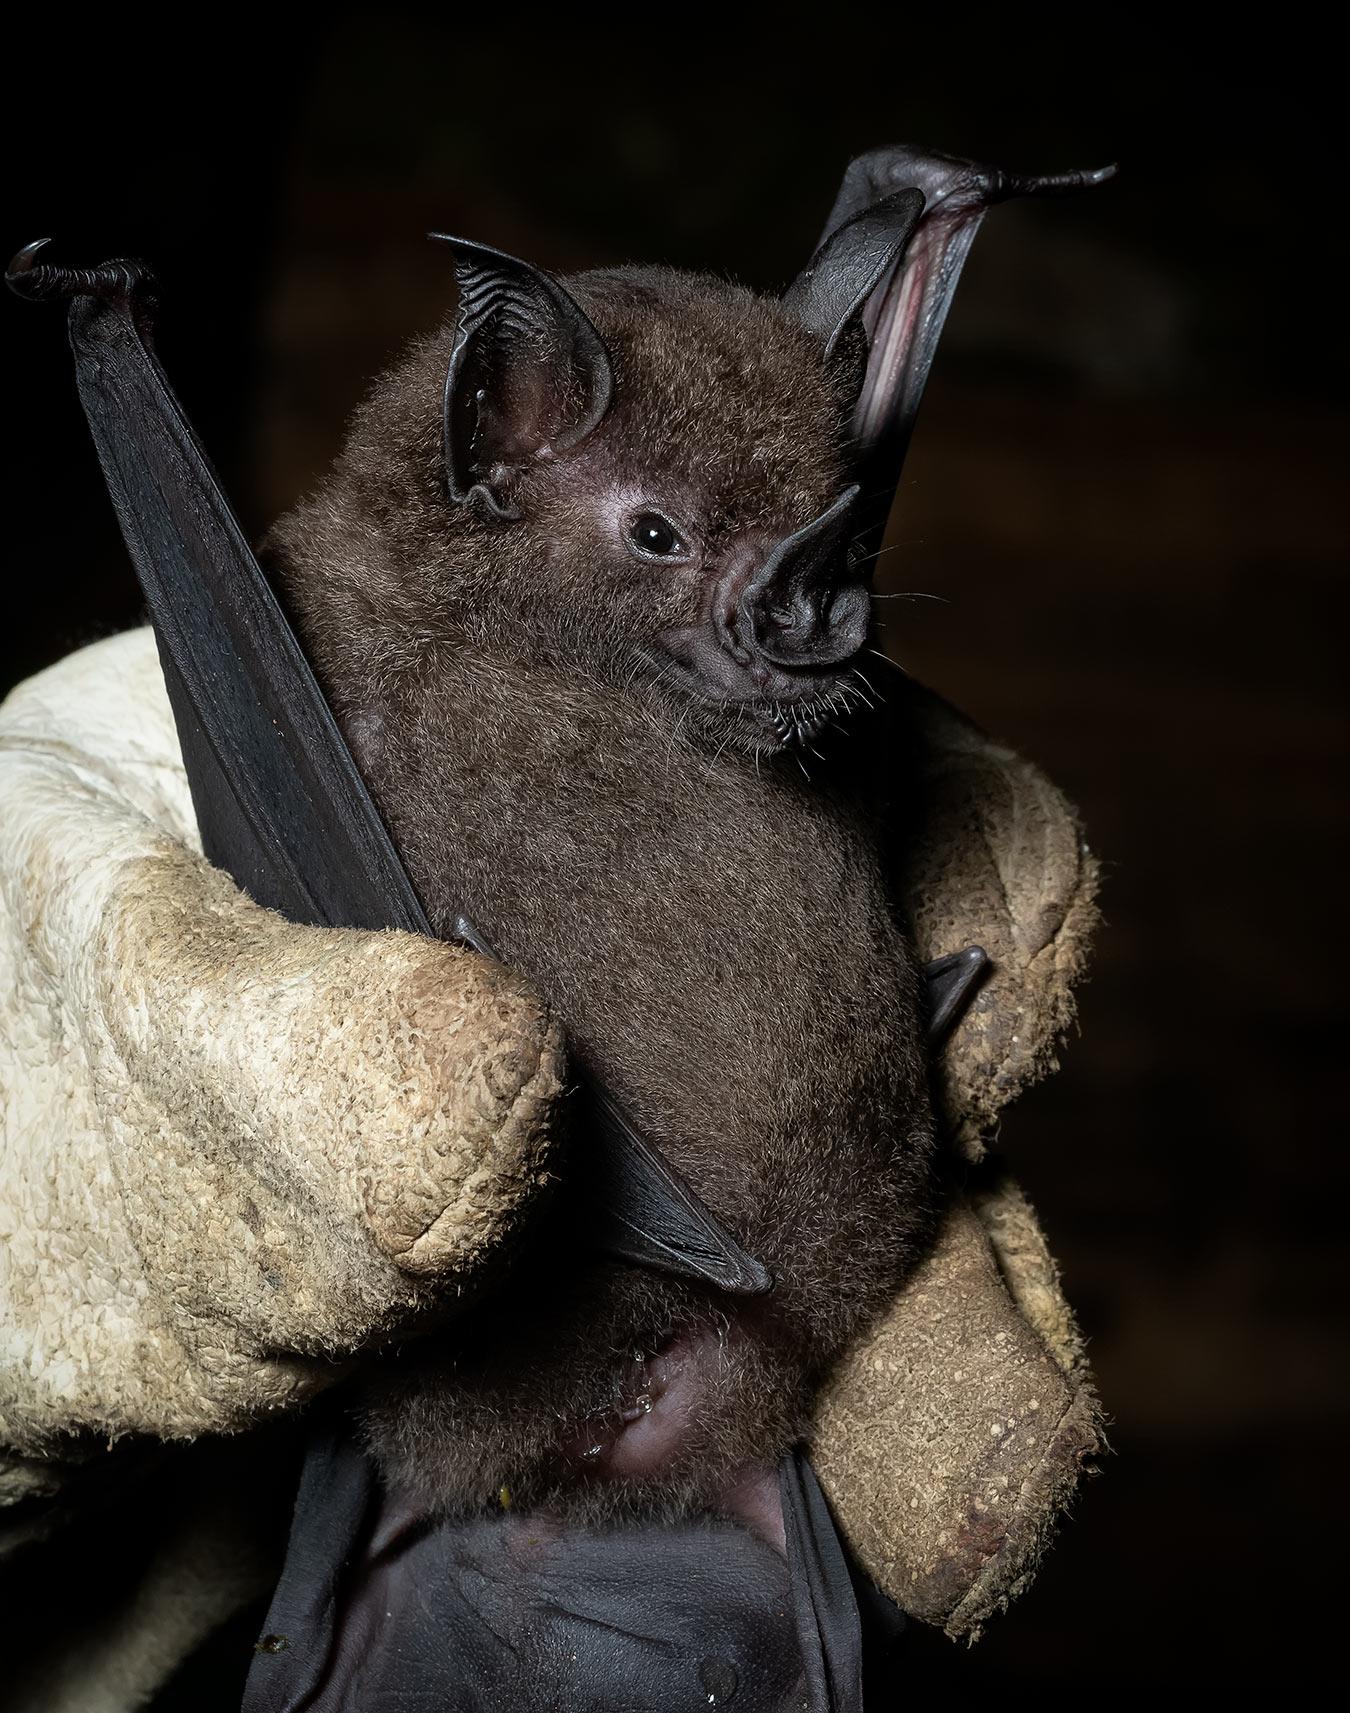 Lesser Spear-nosed Bat (Artibeus obscurus), Madre de Dios, Peru